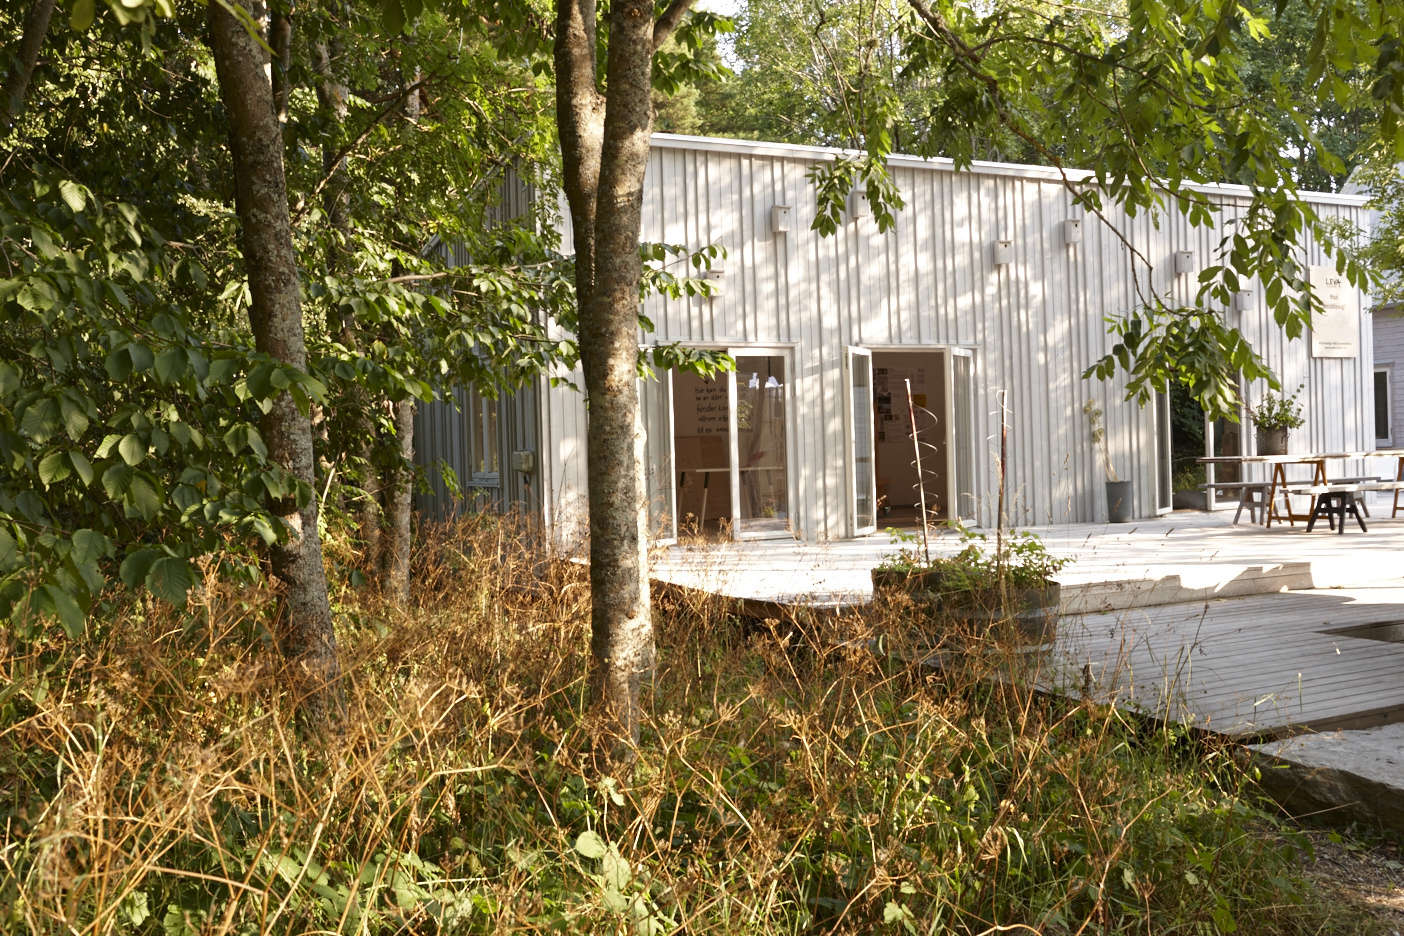 Leva Husfabrik: Flat-Pack Prefab Summerhouses from Sweden